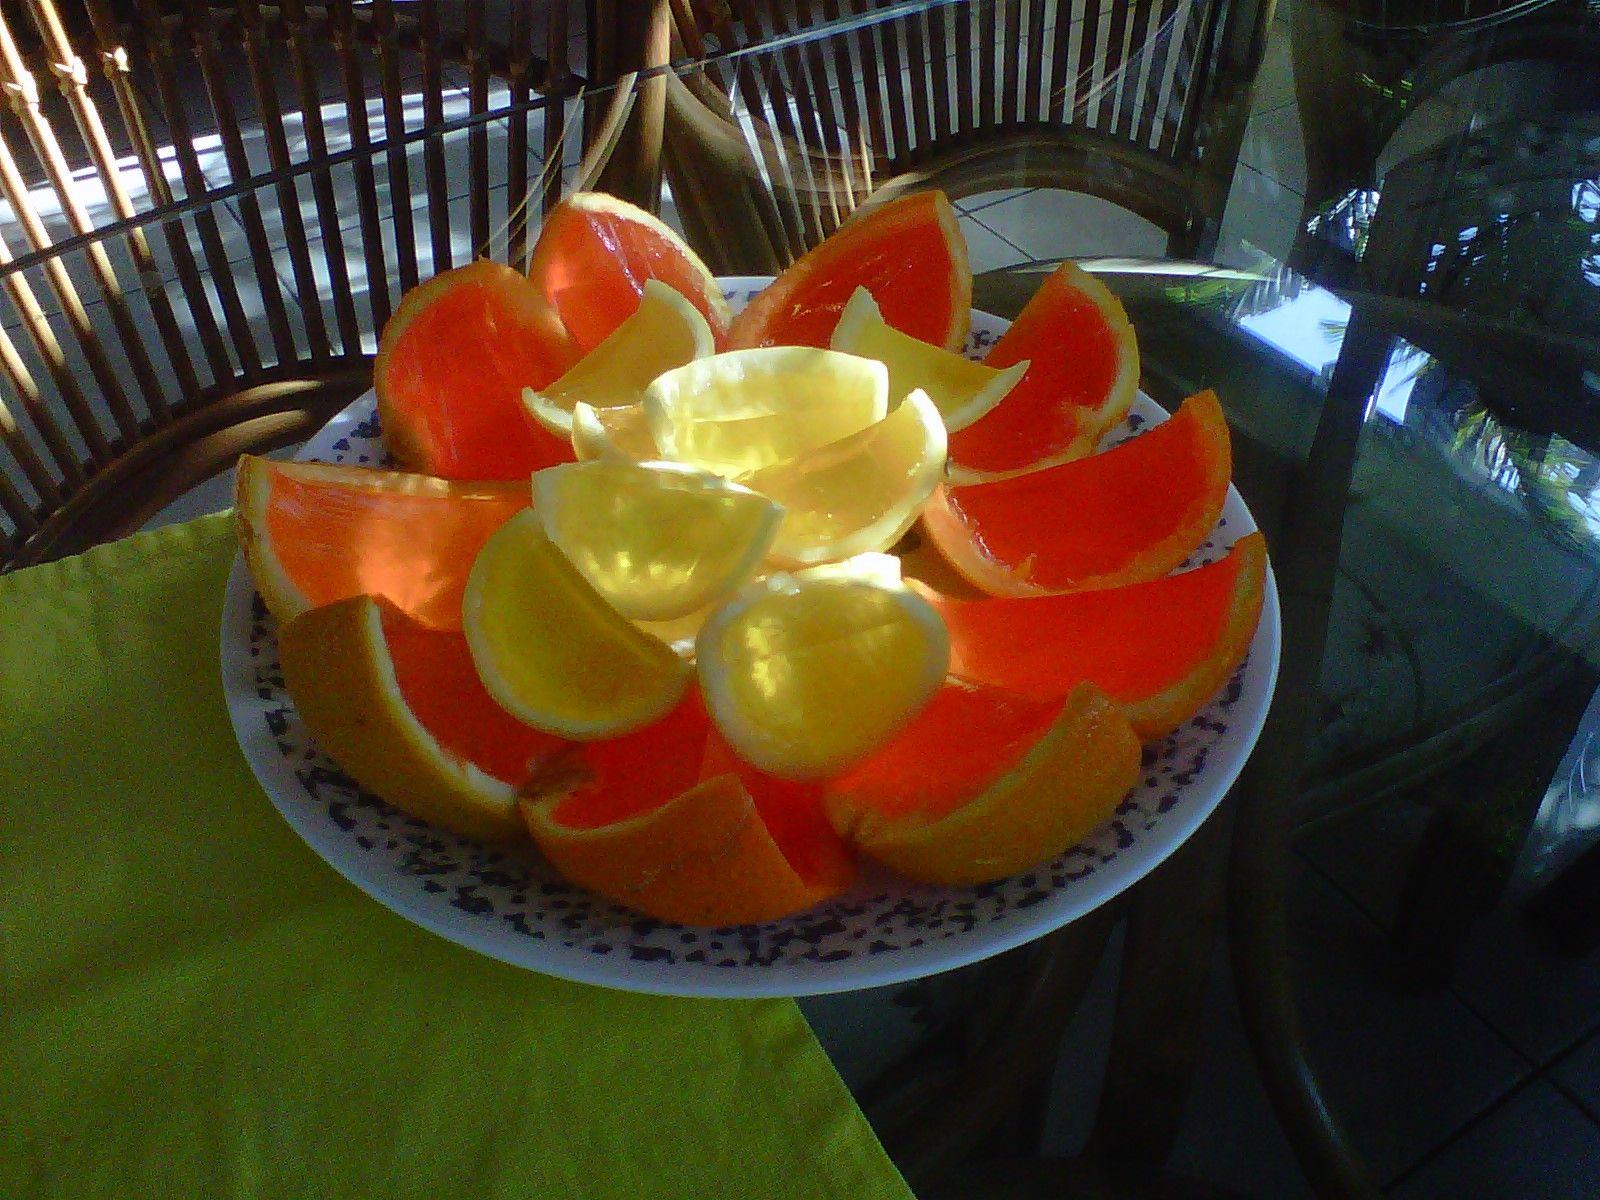 Lemon/Orange Jello Shots